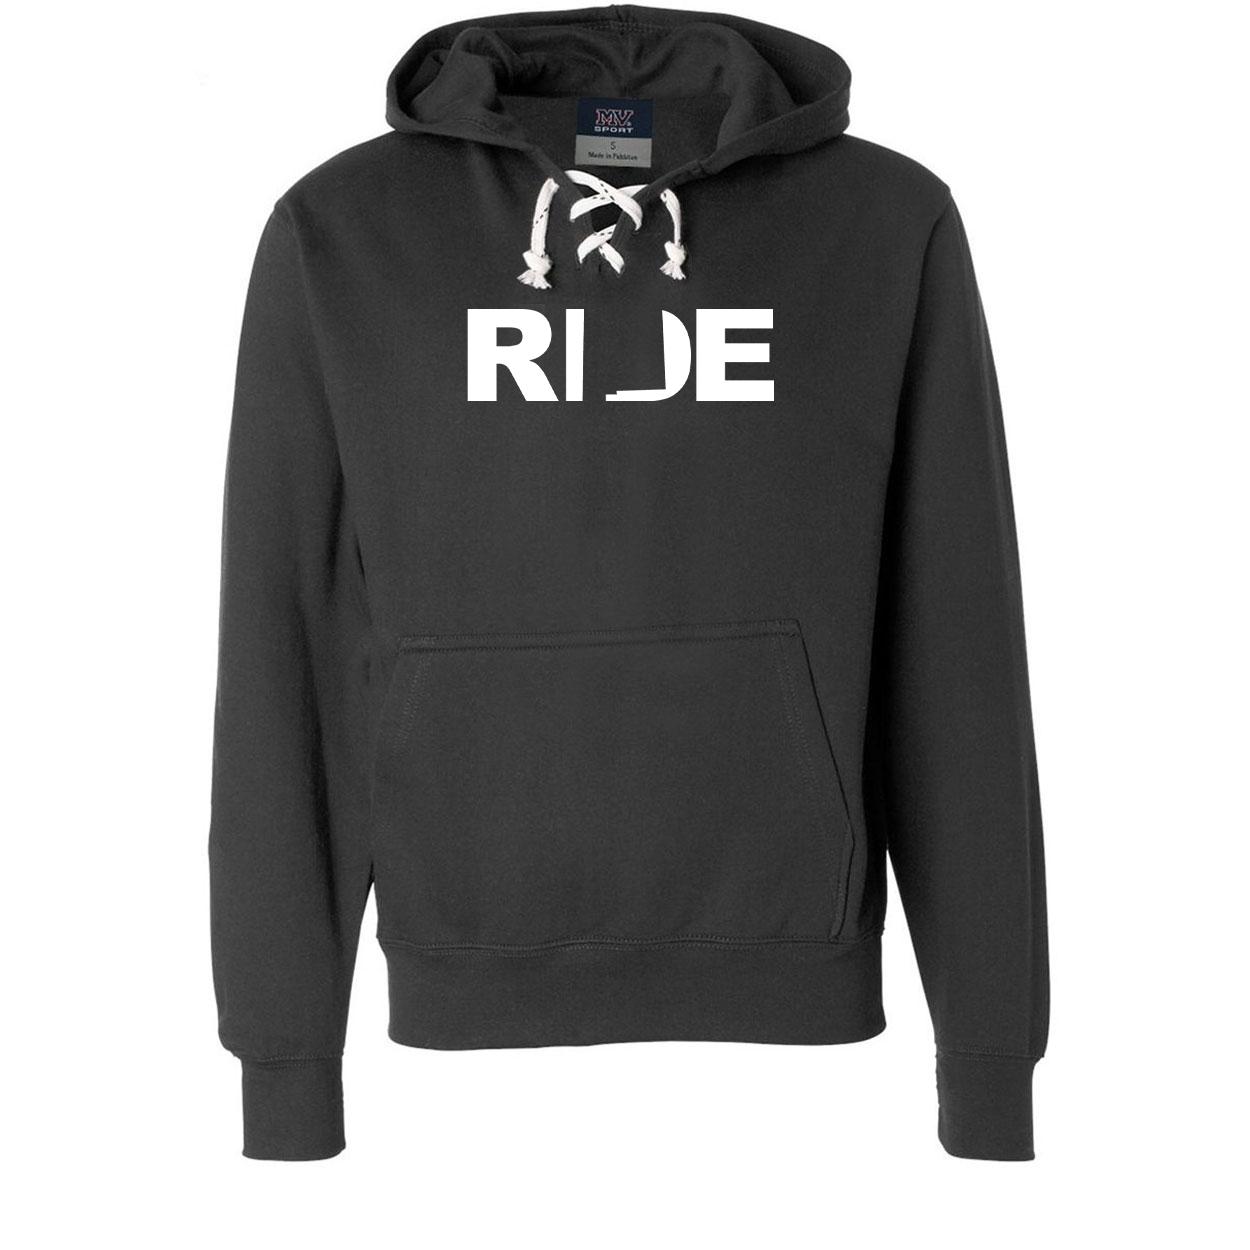 Ride New Mexico Classic Unisex Premium Hockey Sweatshirt Black (White Logo)